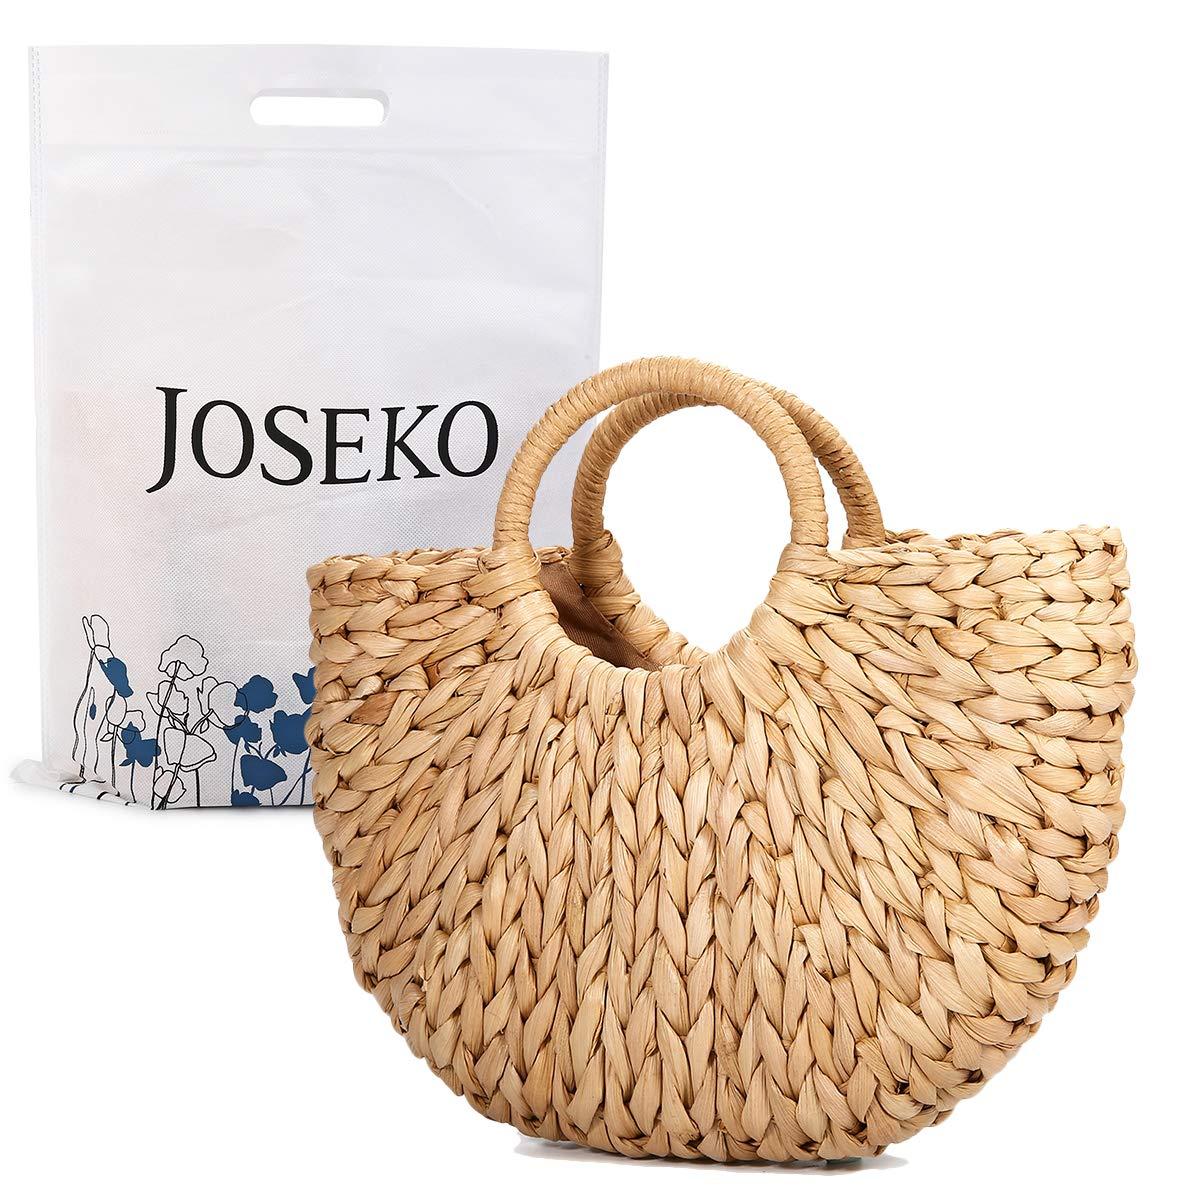 Summer Beach Bag, JOSEKO Women Straw Handbag Top Handle Shoulder Bag Travel Tote Purse